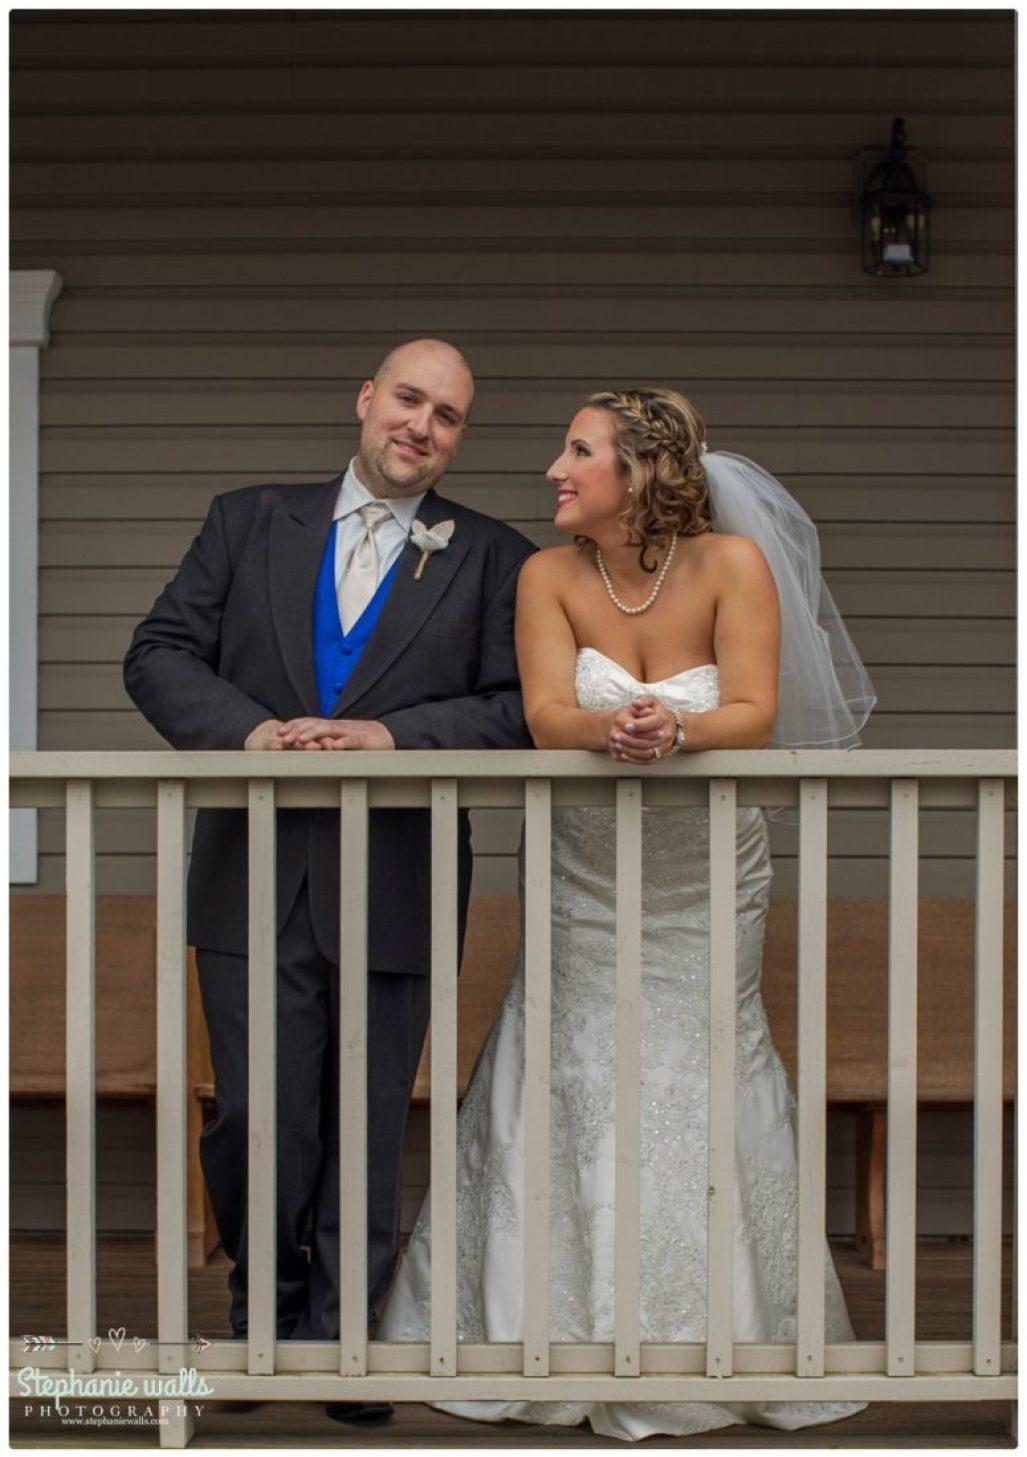 2016 03 24 0077 Racing Love   Snohomish Event Center   Snohomish Wedding Photographer